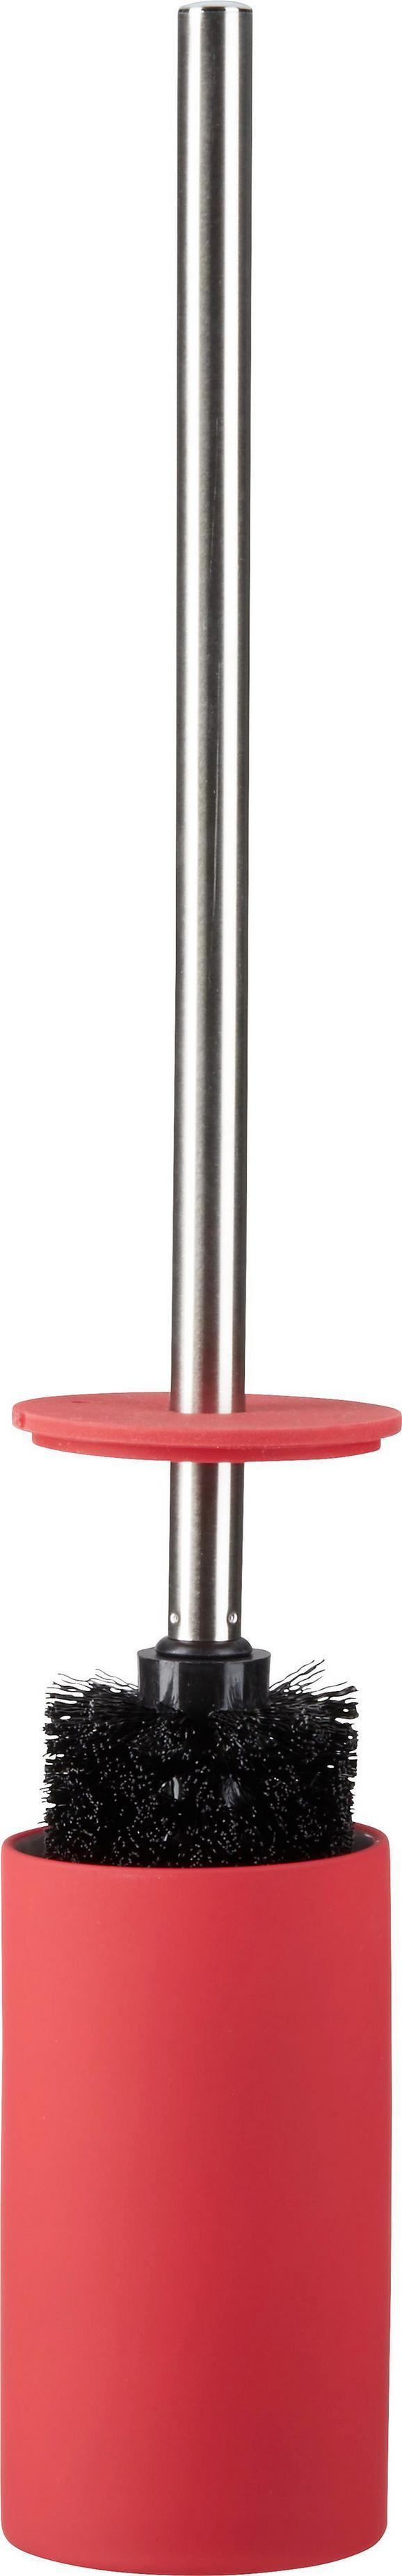 Wc-kefe Melanie - Ezüst, Műanyag/Fém (8/45cm) - Mömax modern living